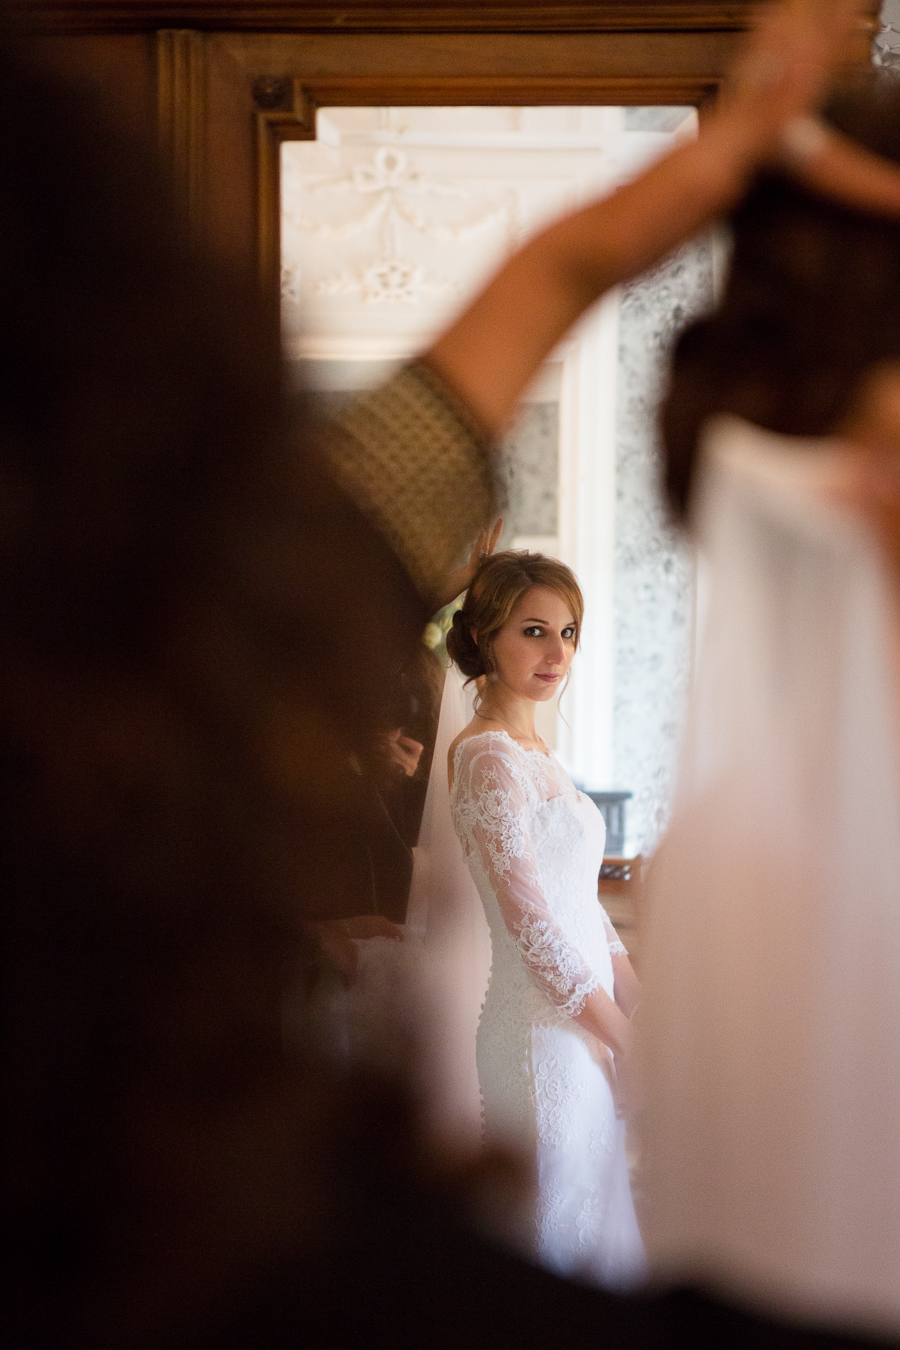 photographe-reportage-mariage-keith-flament-chateau-aveny-14